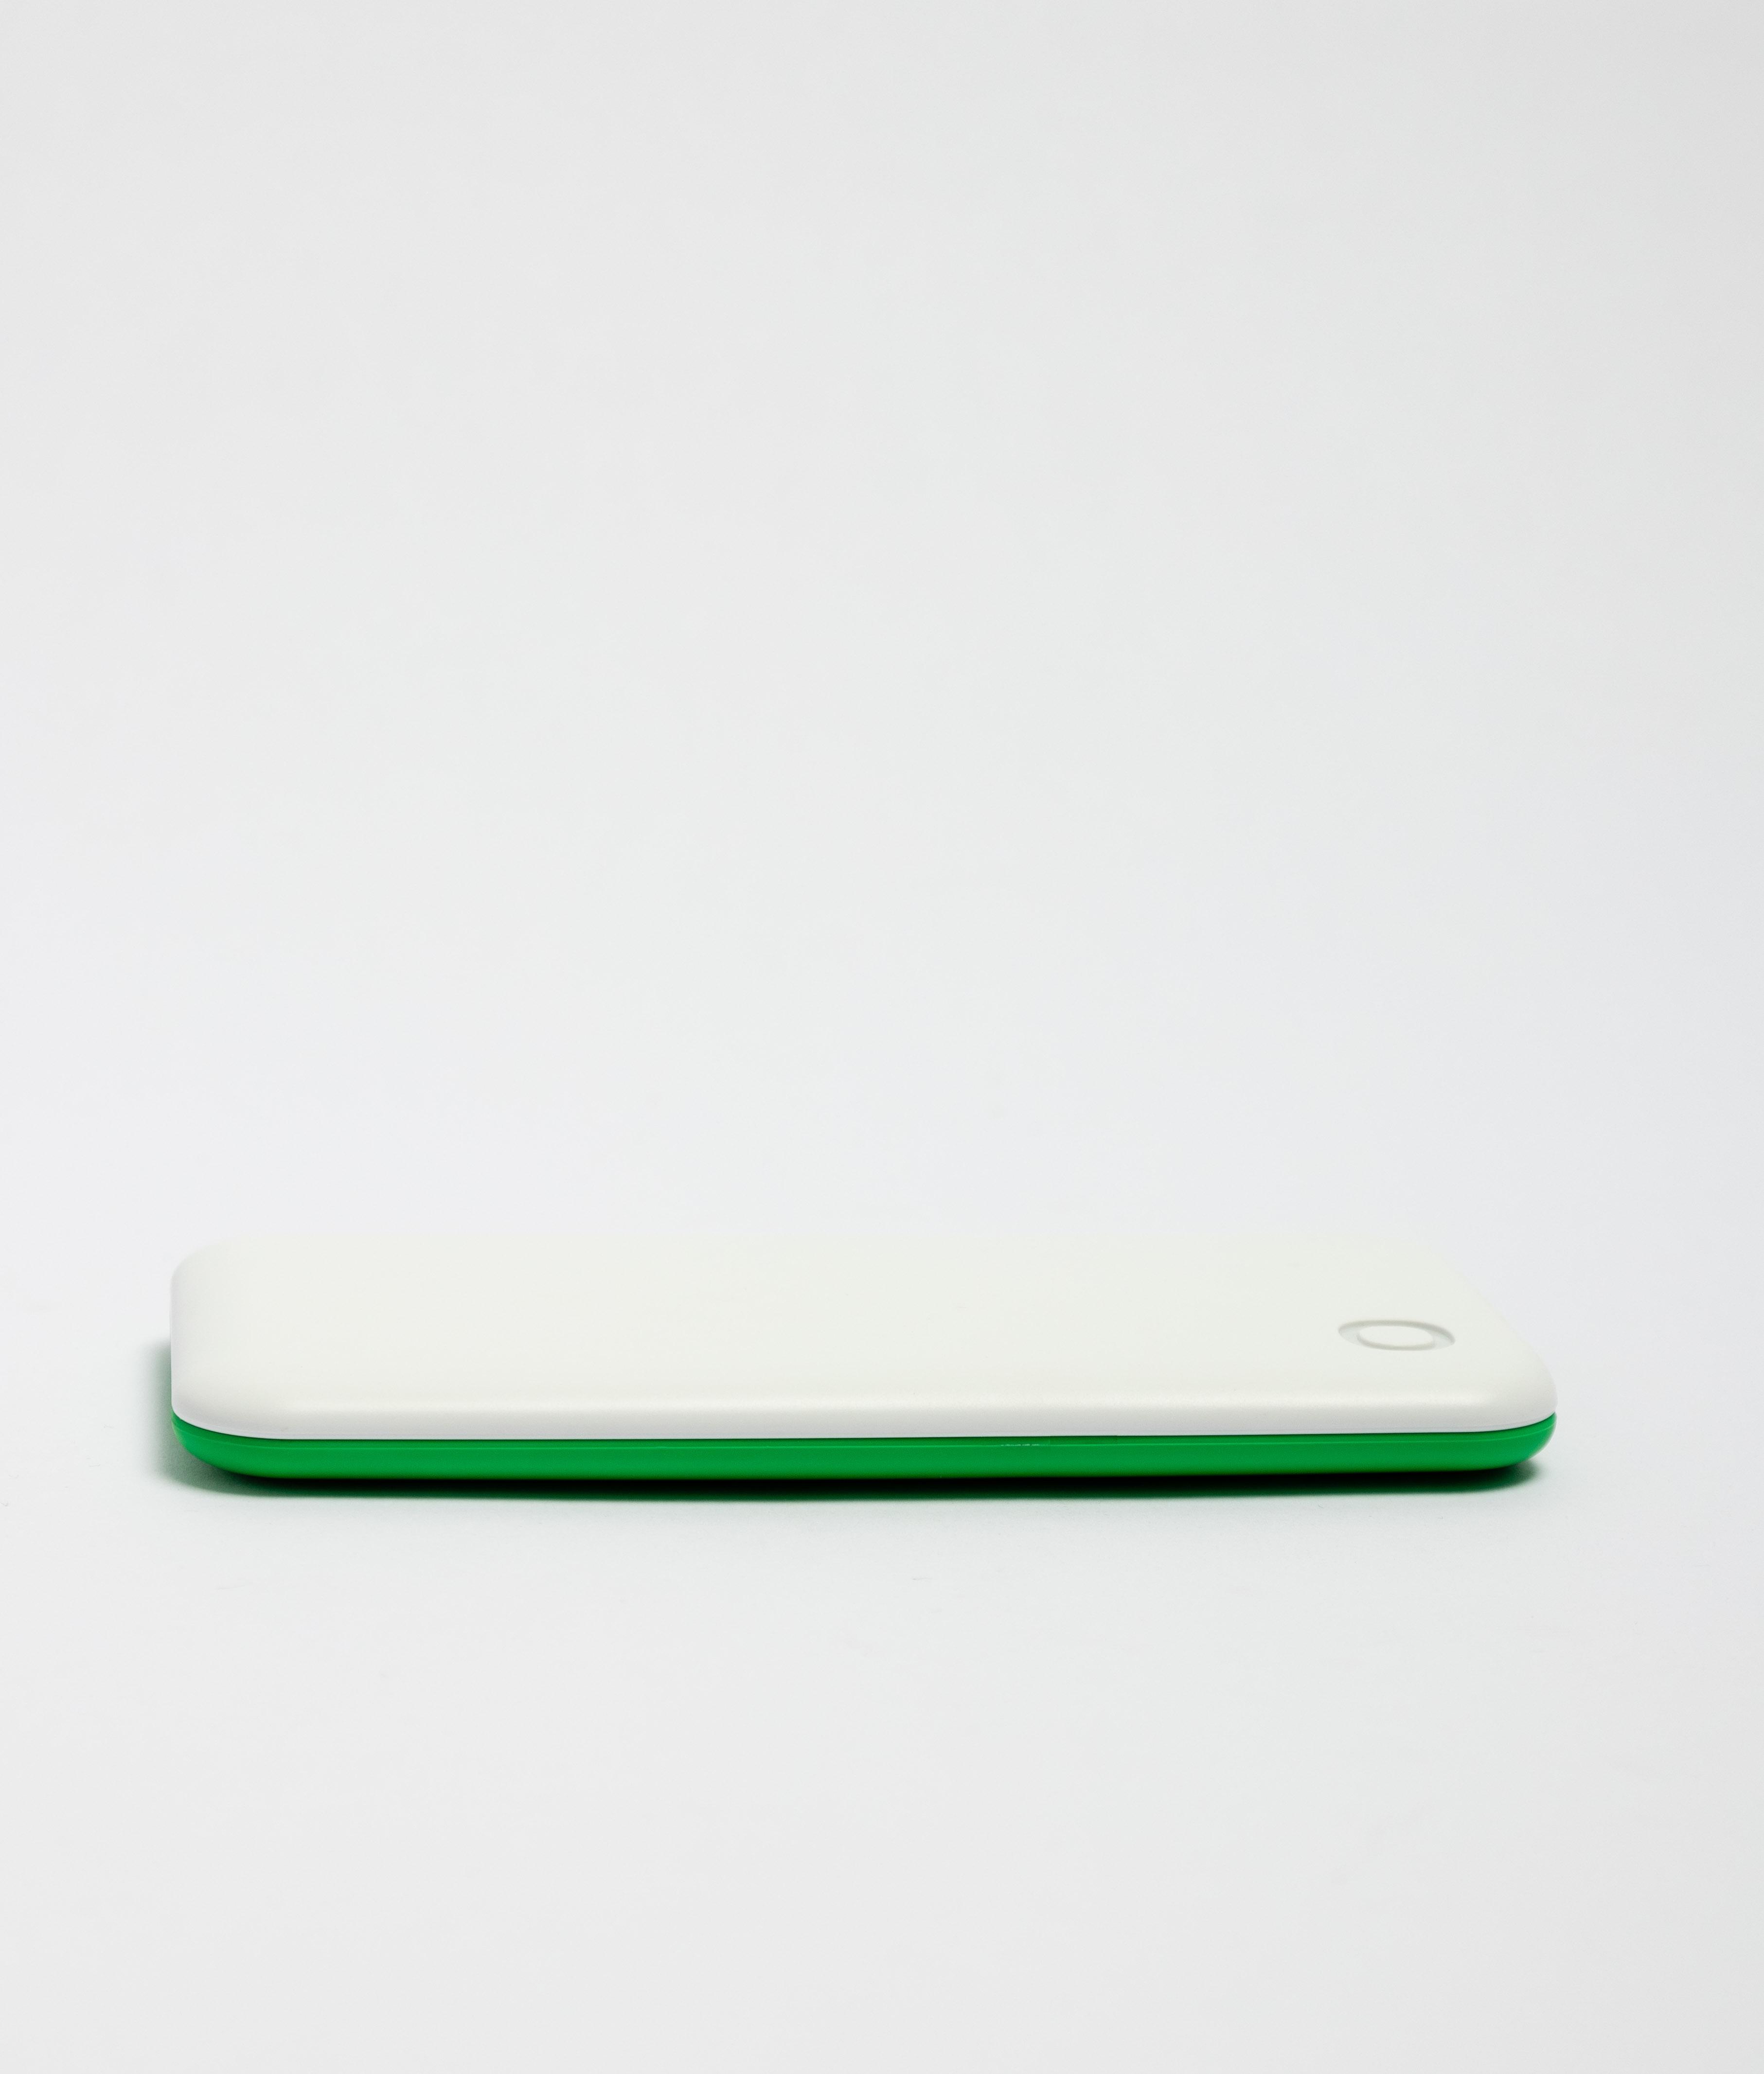 Batería Externa Robbie - Verde